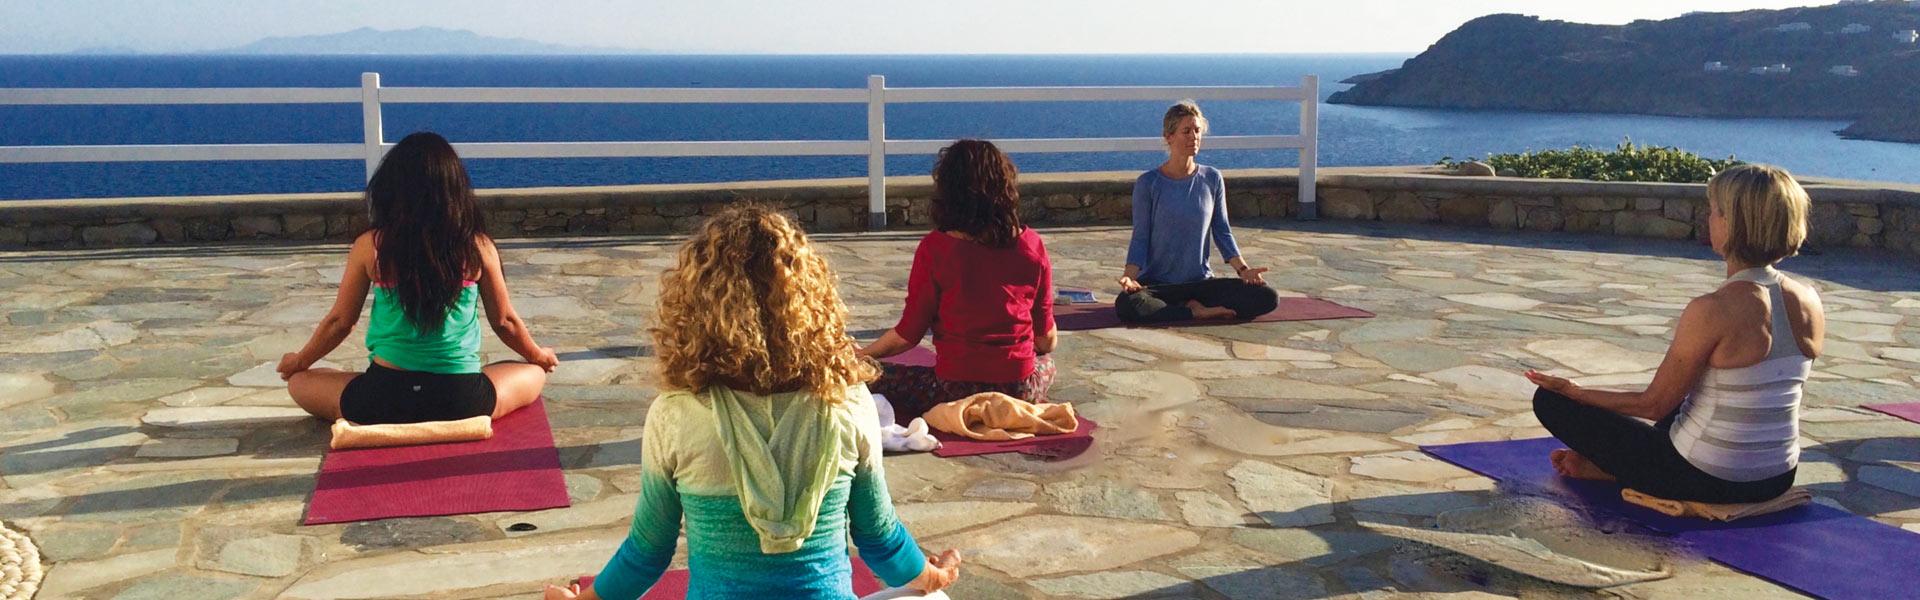 yoga escapes shot overlooking the sea